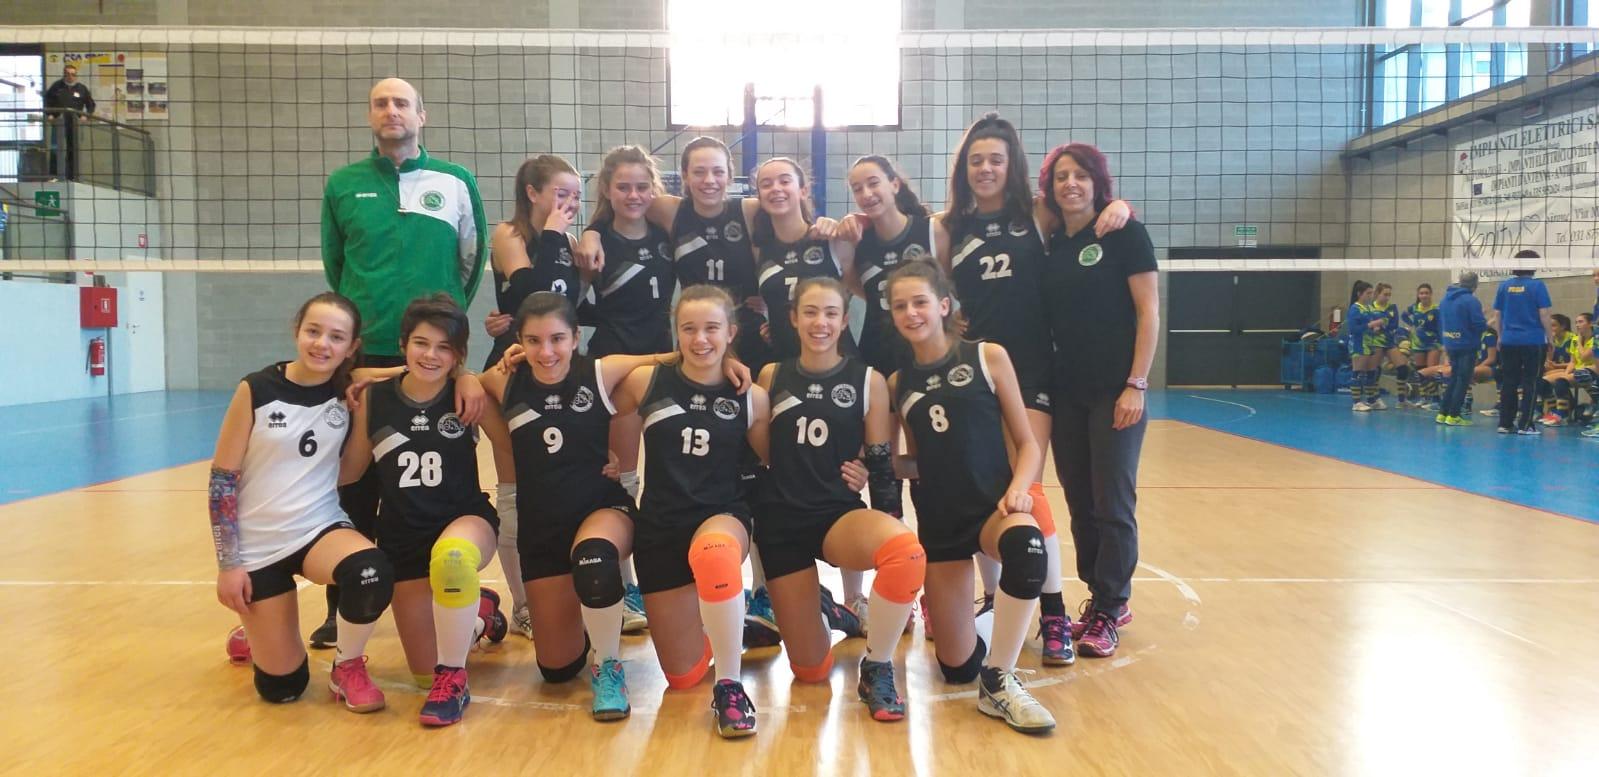 eagle cup 2019 Oggiono under 16